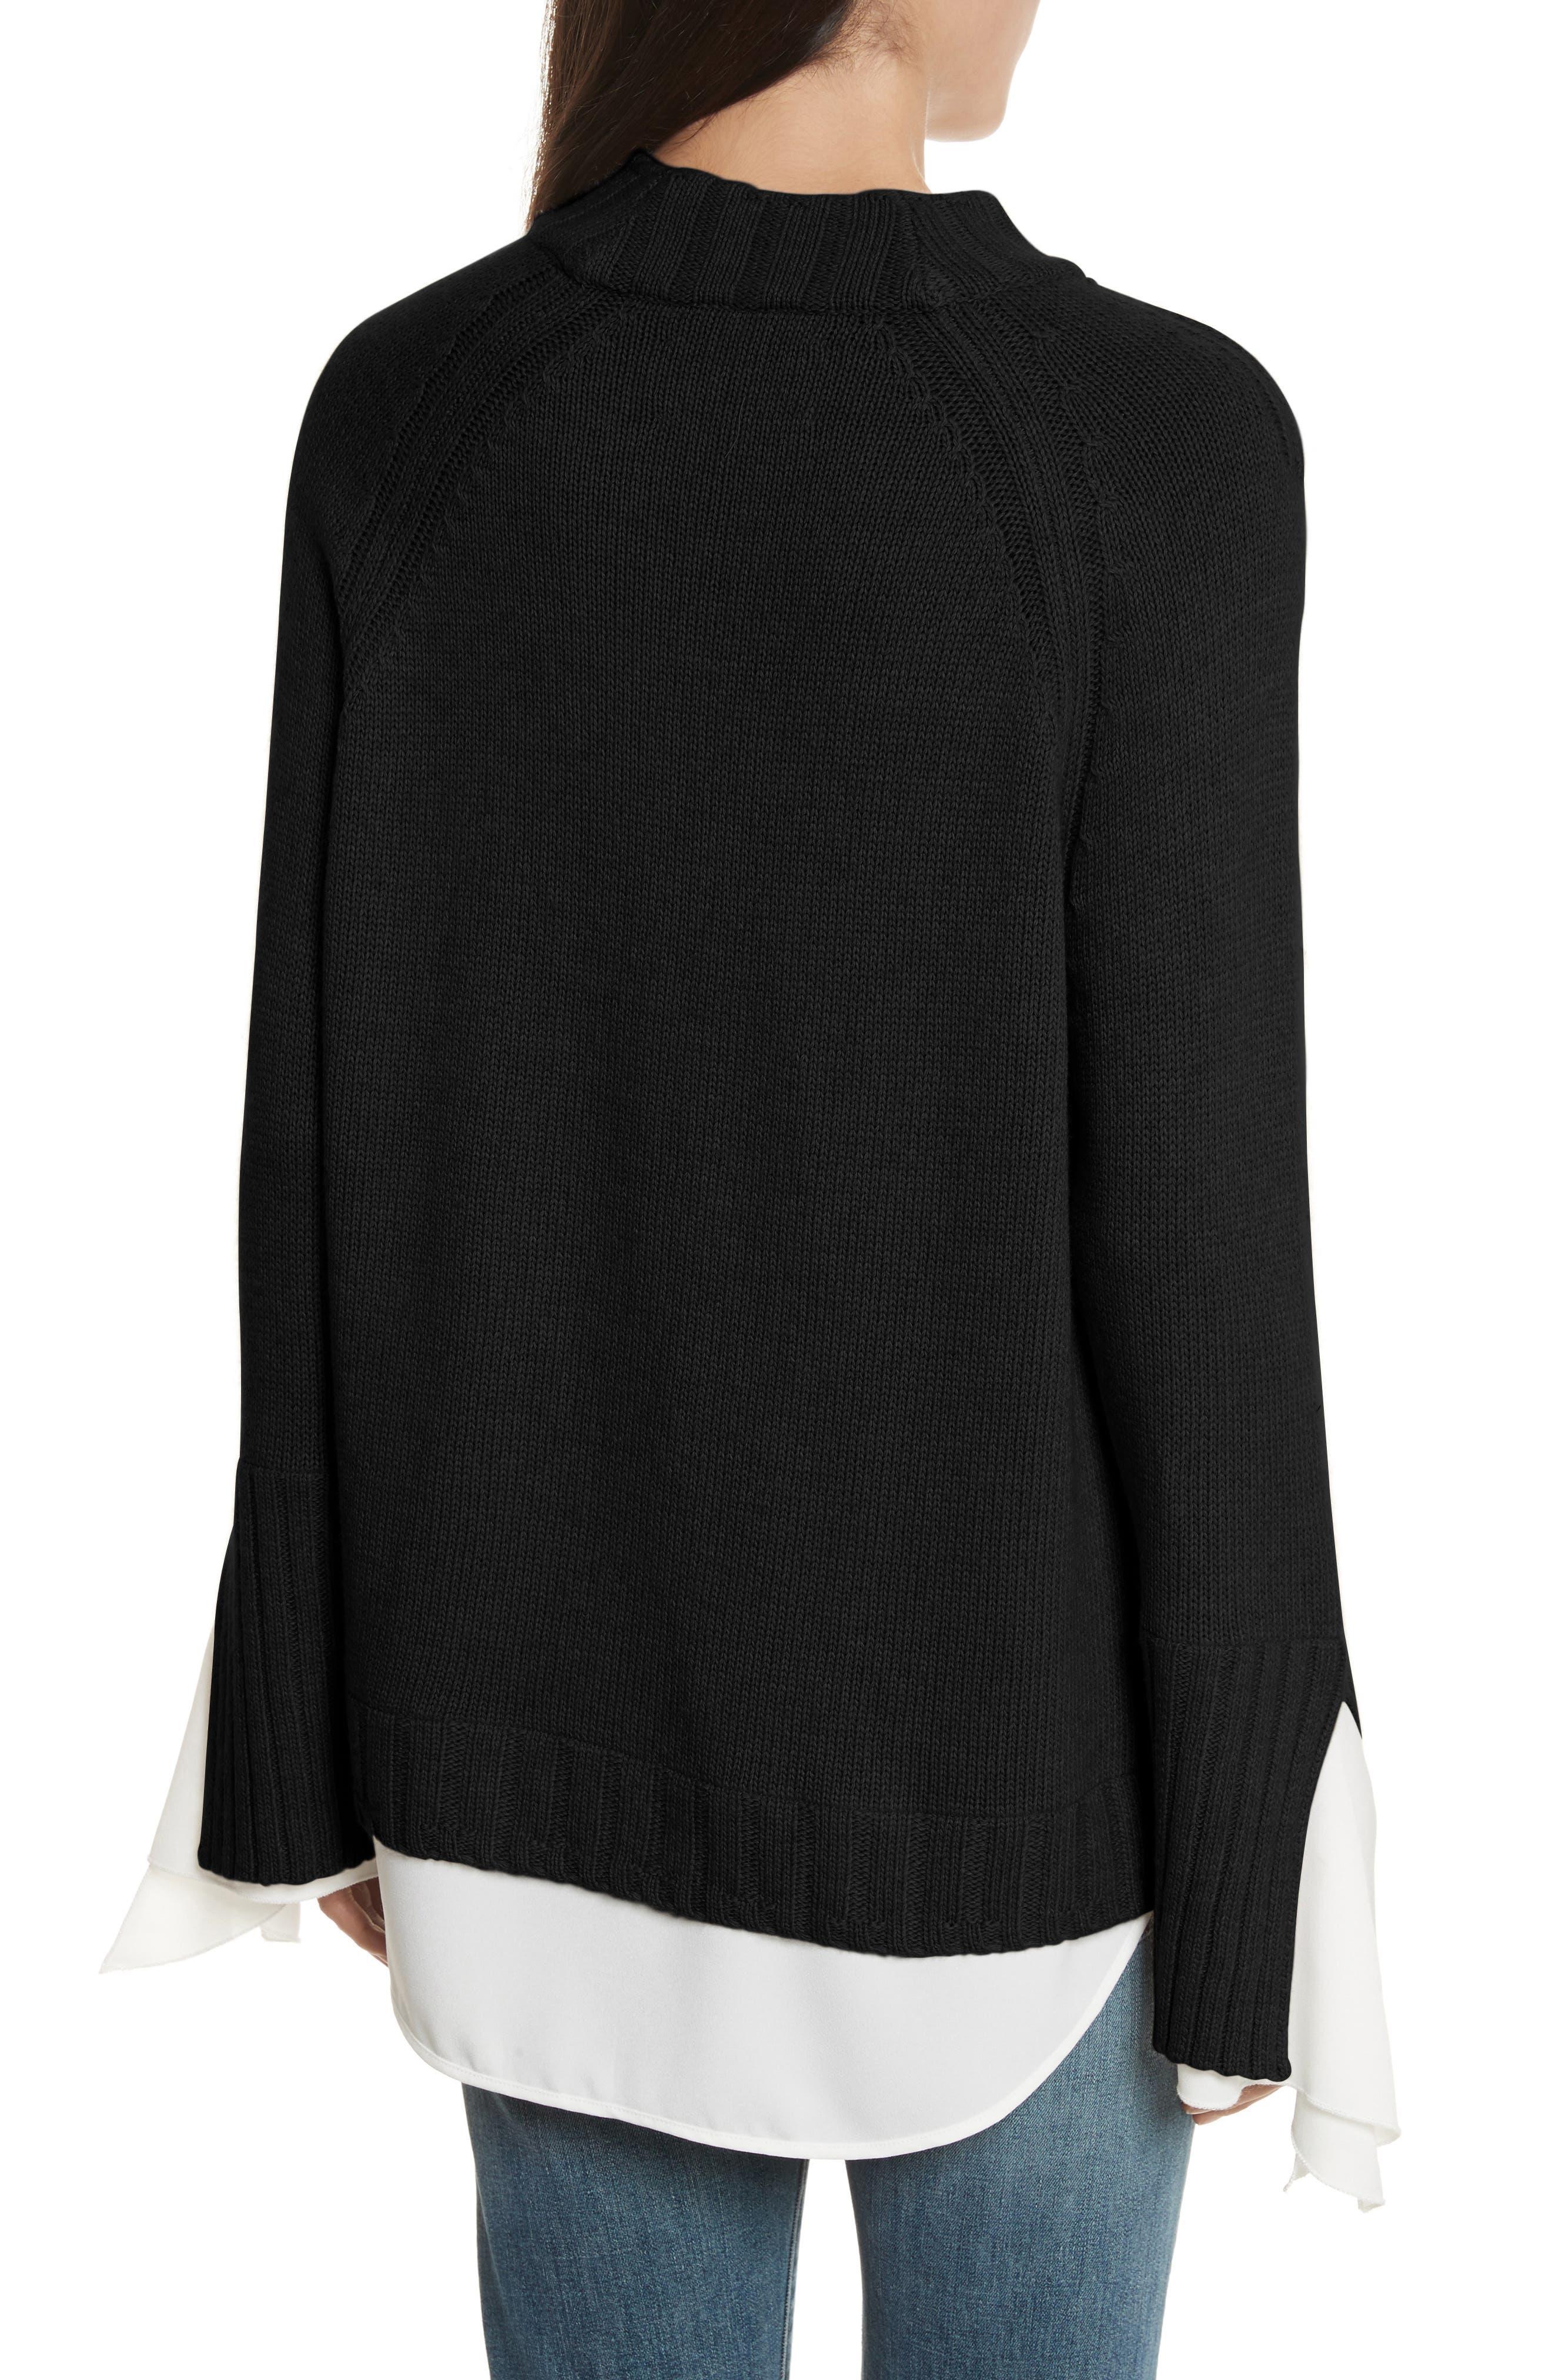 Remi Layered Pullover,                             Alternate thumbnail 2, color,                             Black/ White